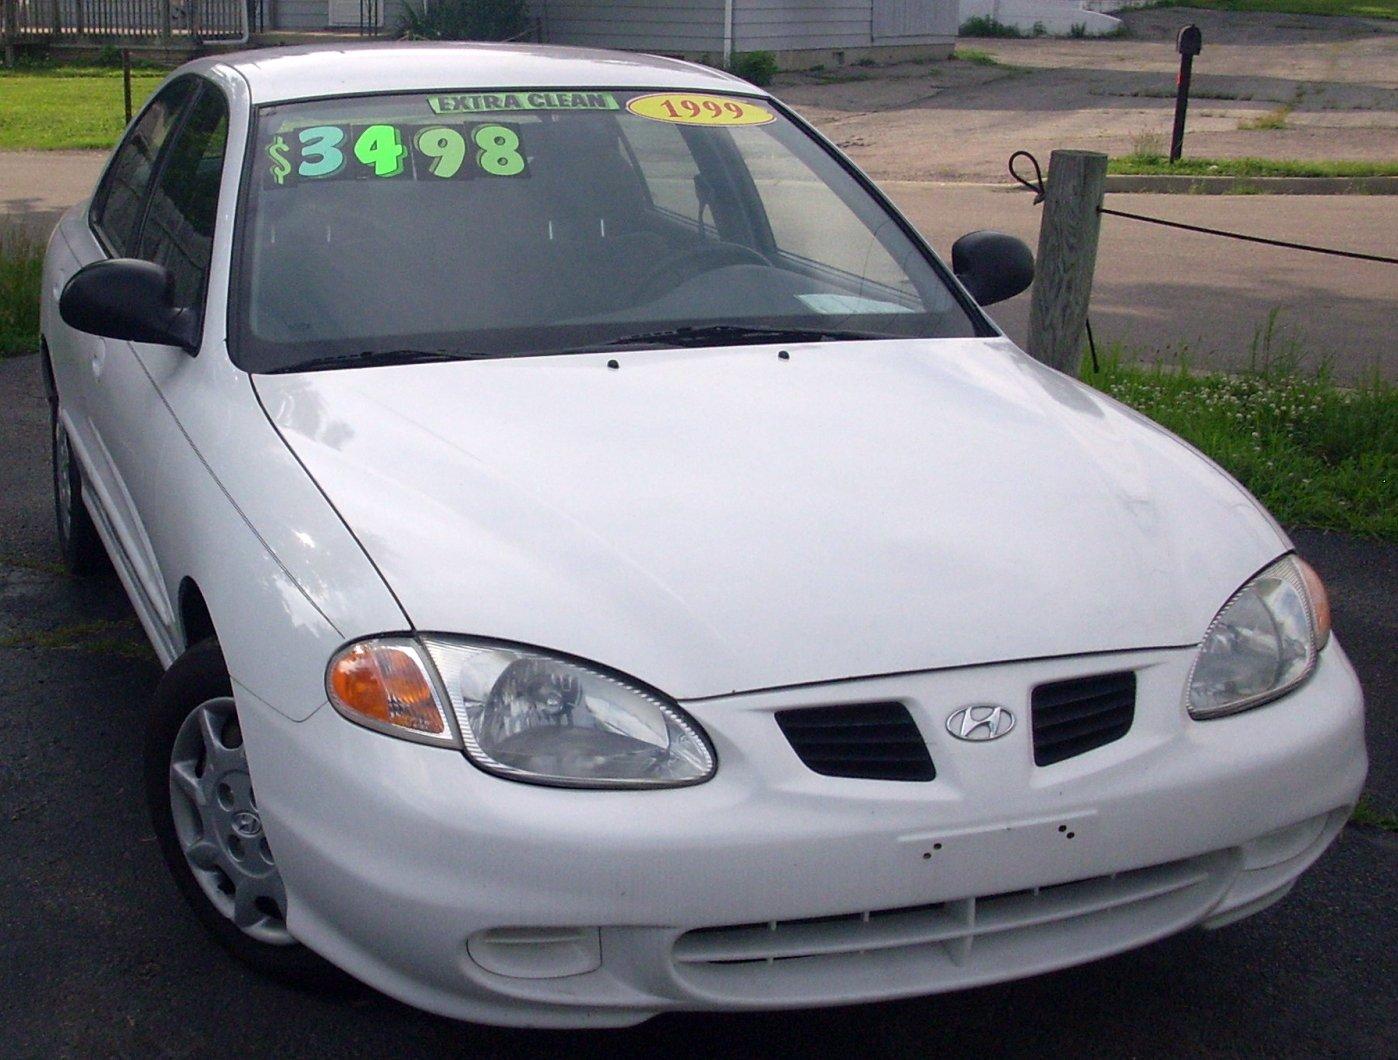 1999 Hyundai Elantra 8